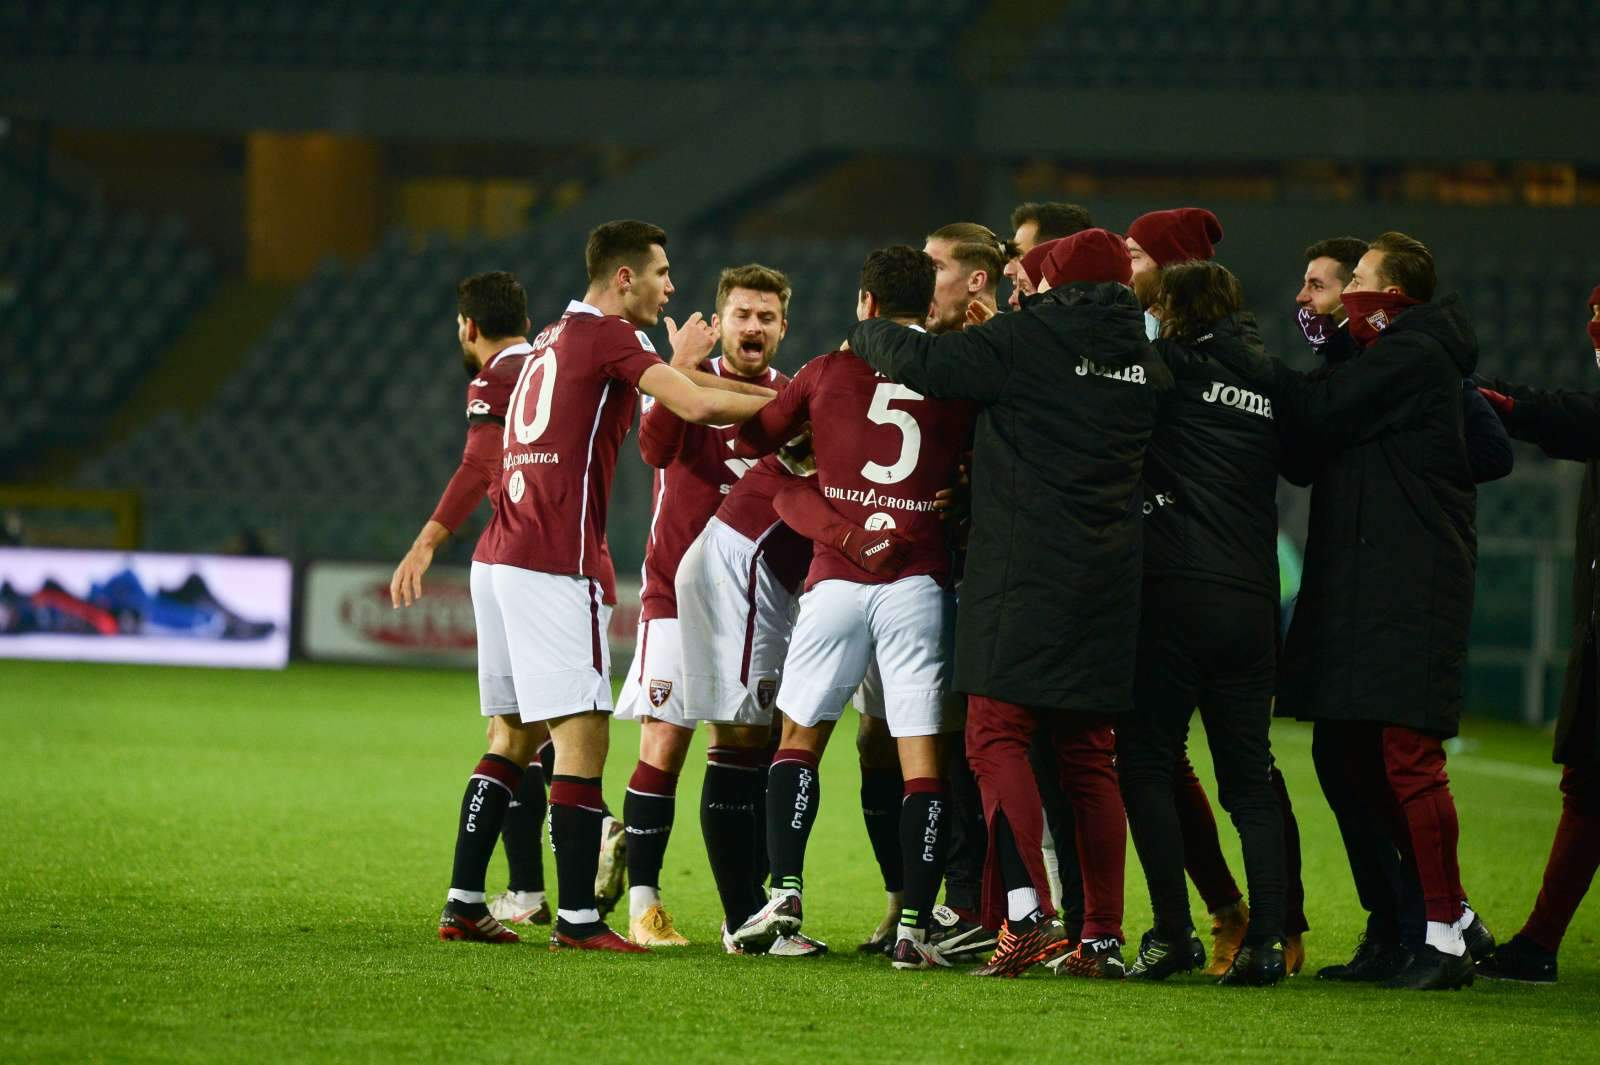 «Торино» – «Кремонезе»: прогноз на матч 1/32 финала Кубка Италии